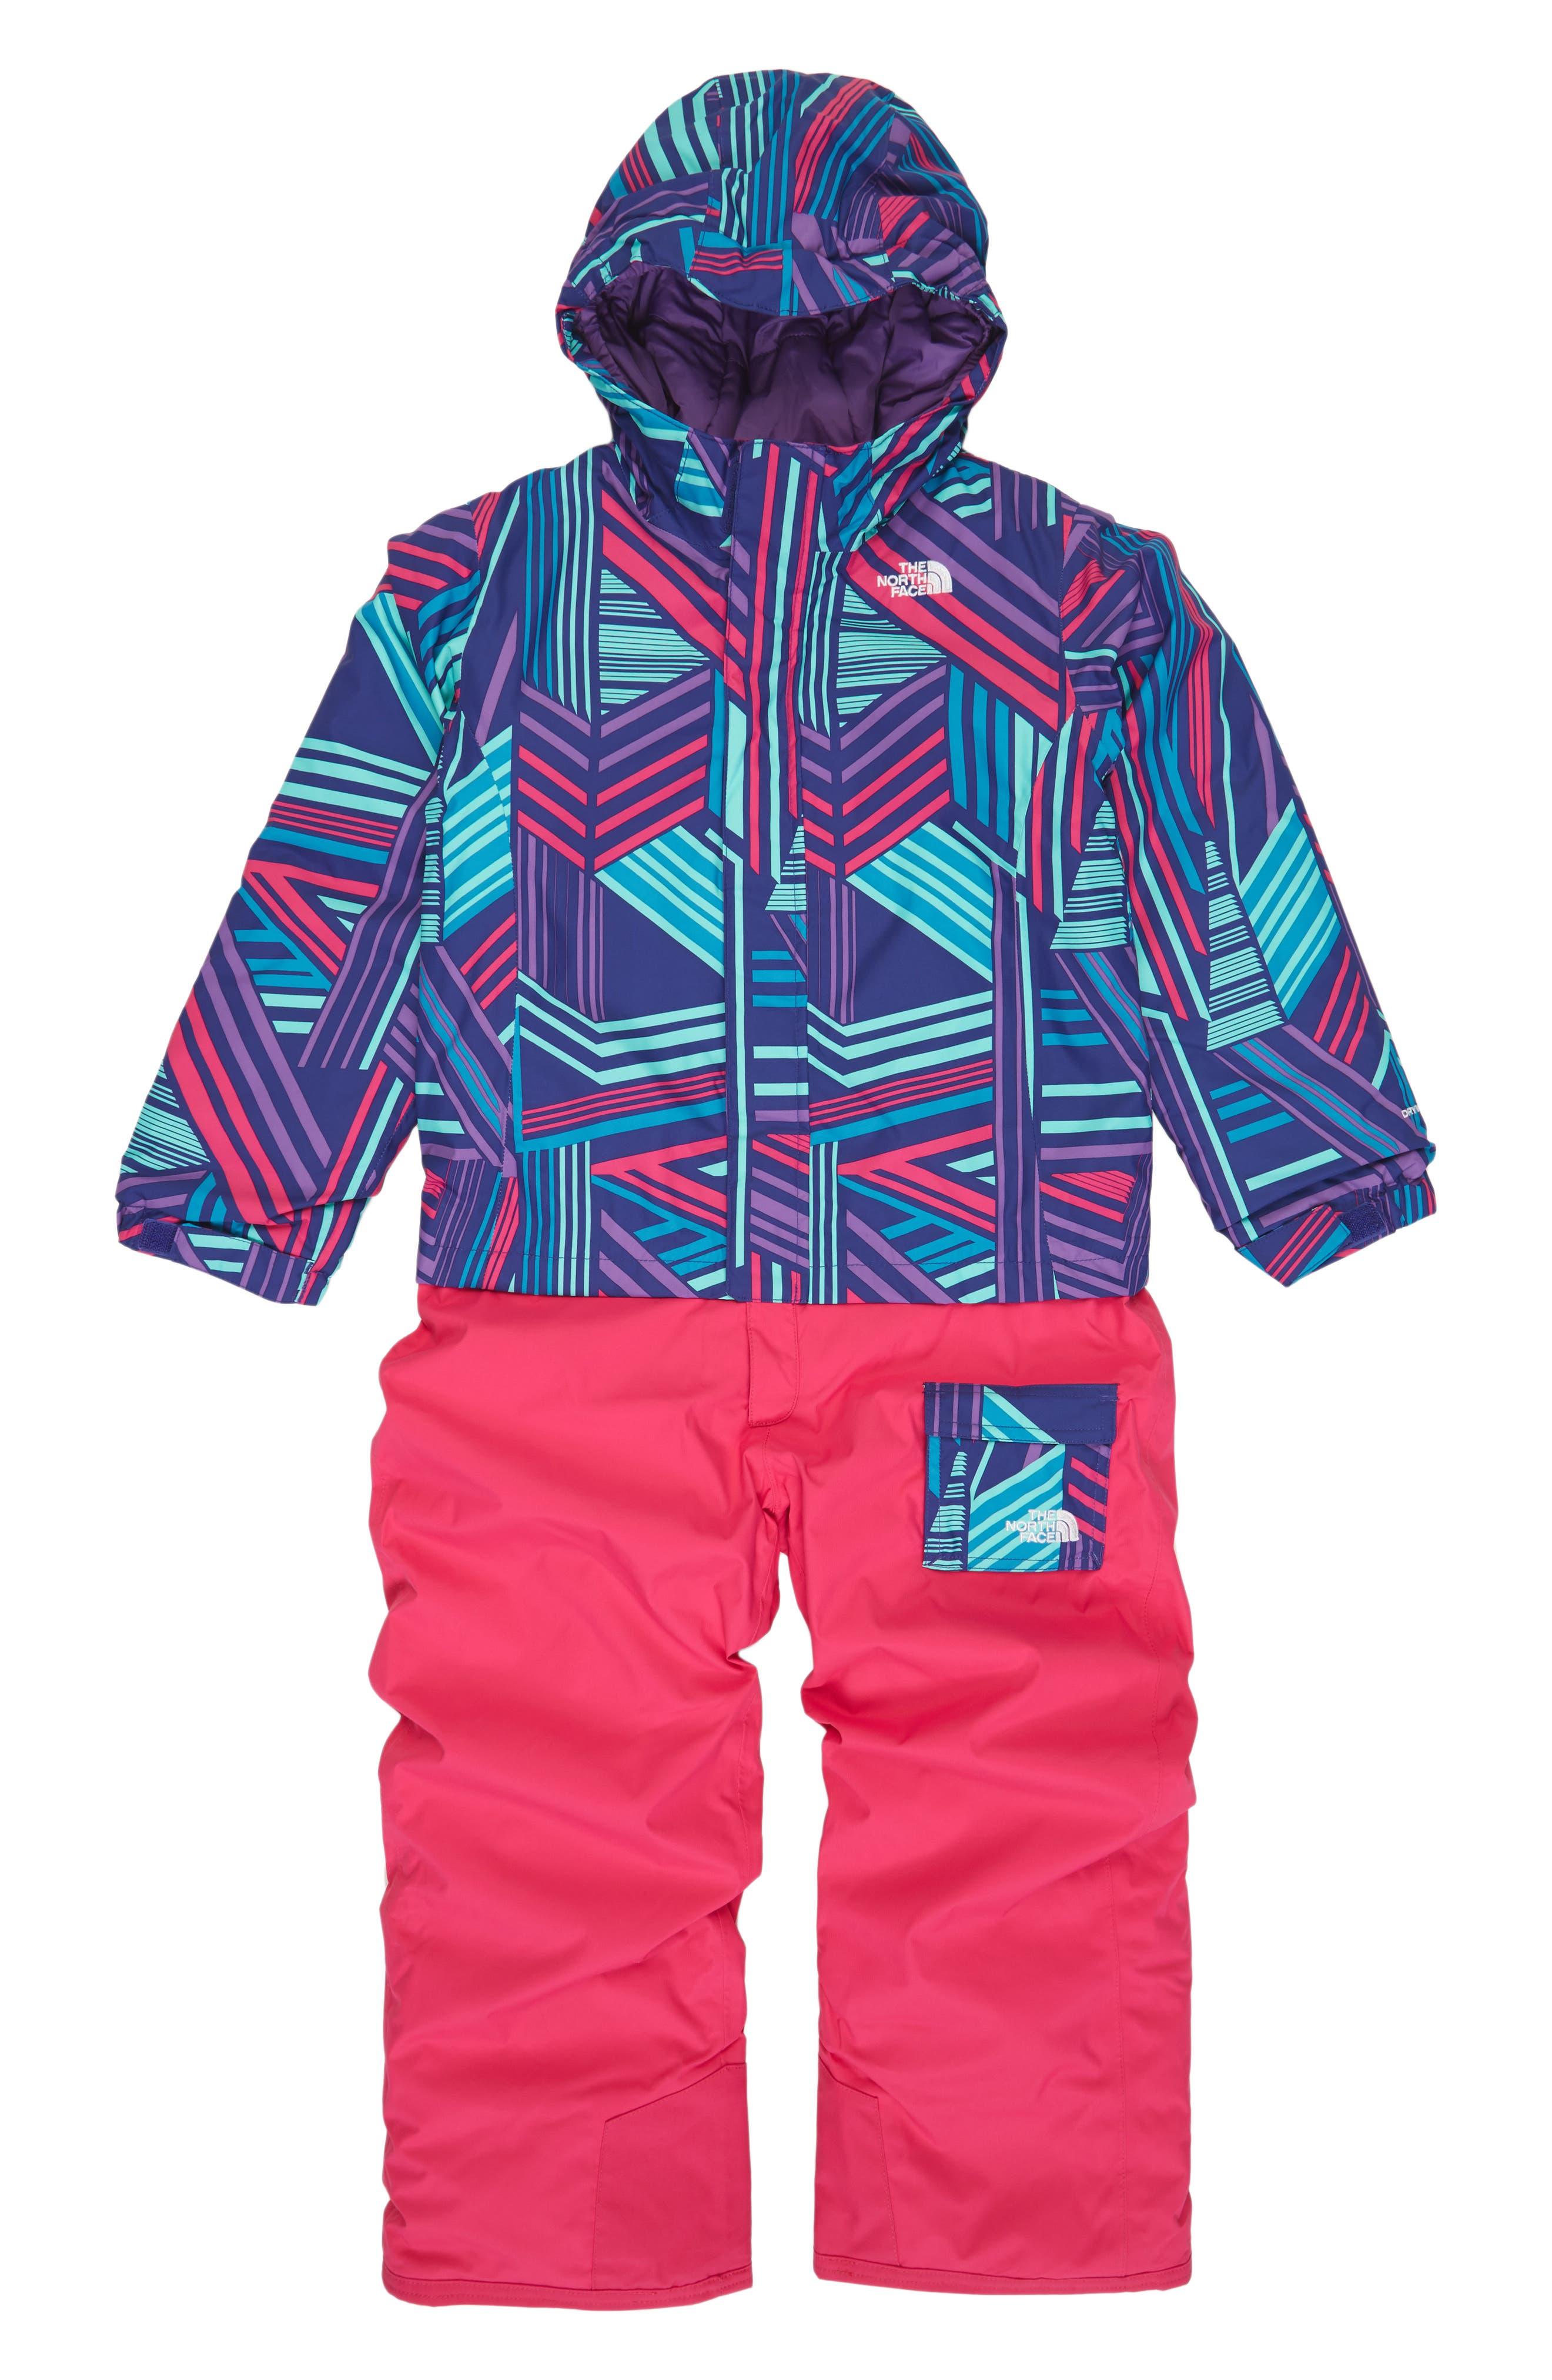 Main Image - The North Face Heatseeker™ Insulated Waterproof Snowsuit (Toddler Girls)